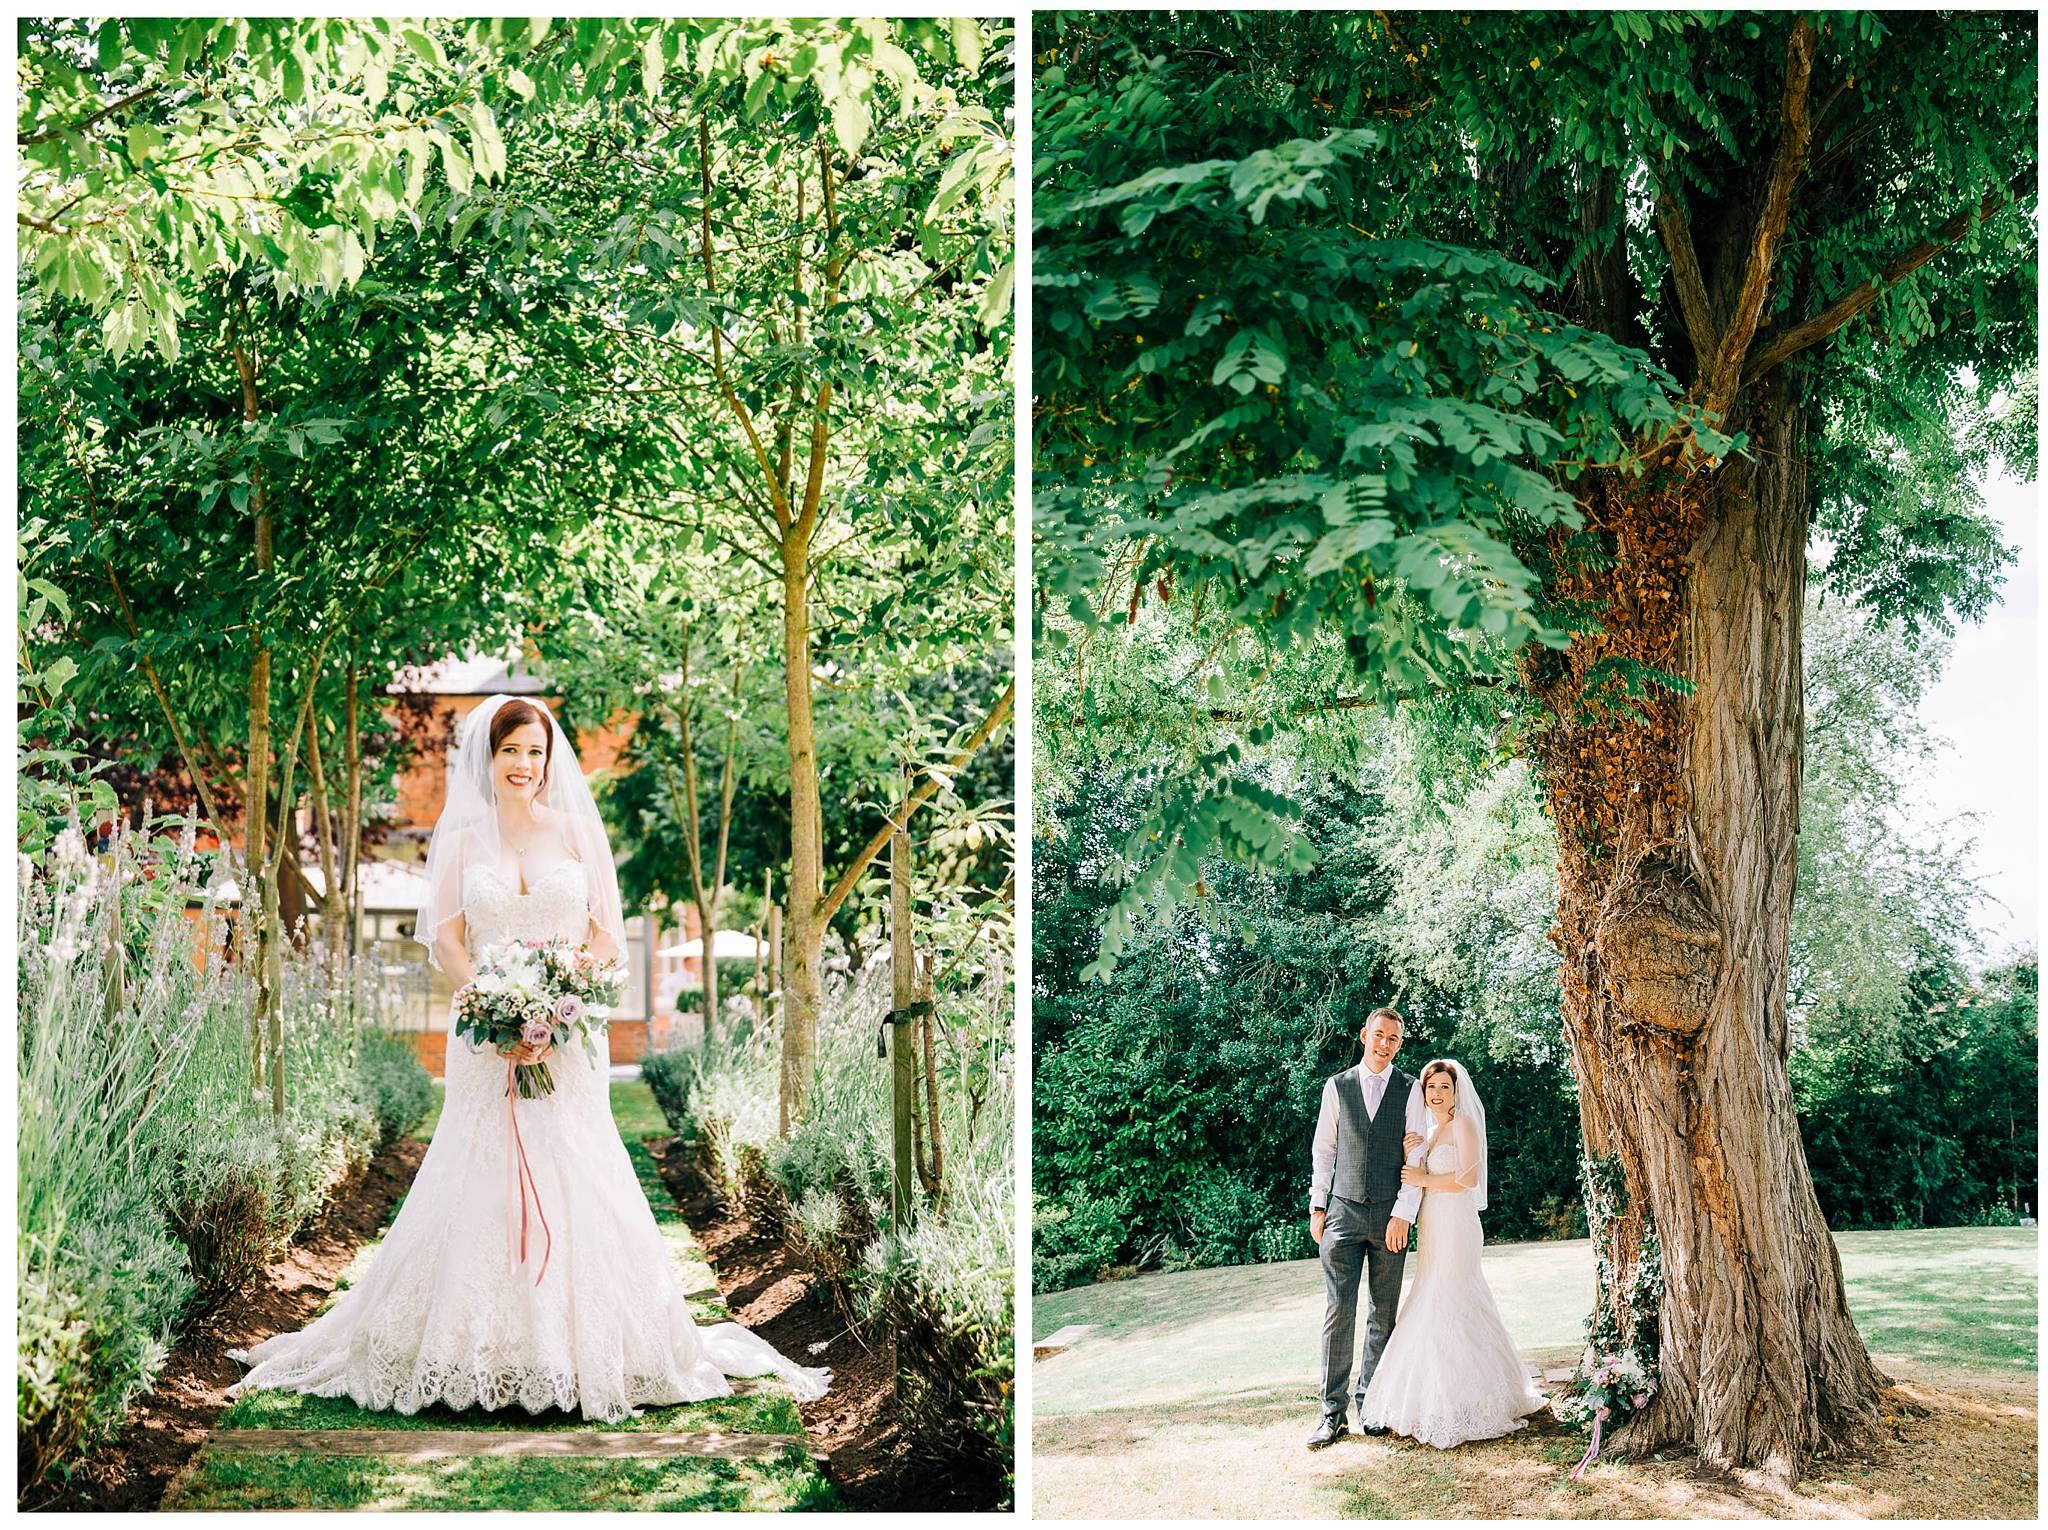 Summer Garden Wedding - The Old Vicarage Boutique Hotel60.jpg